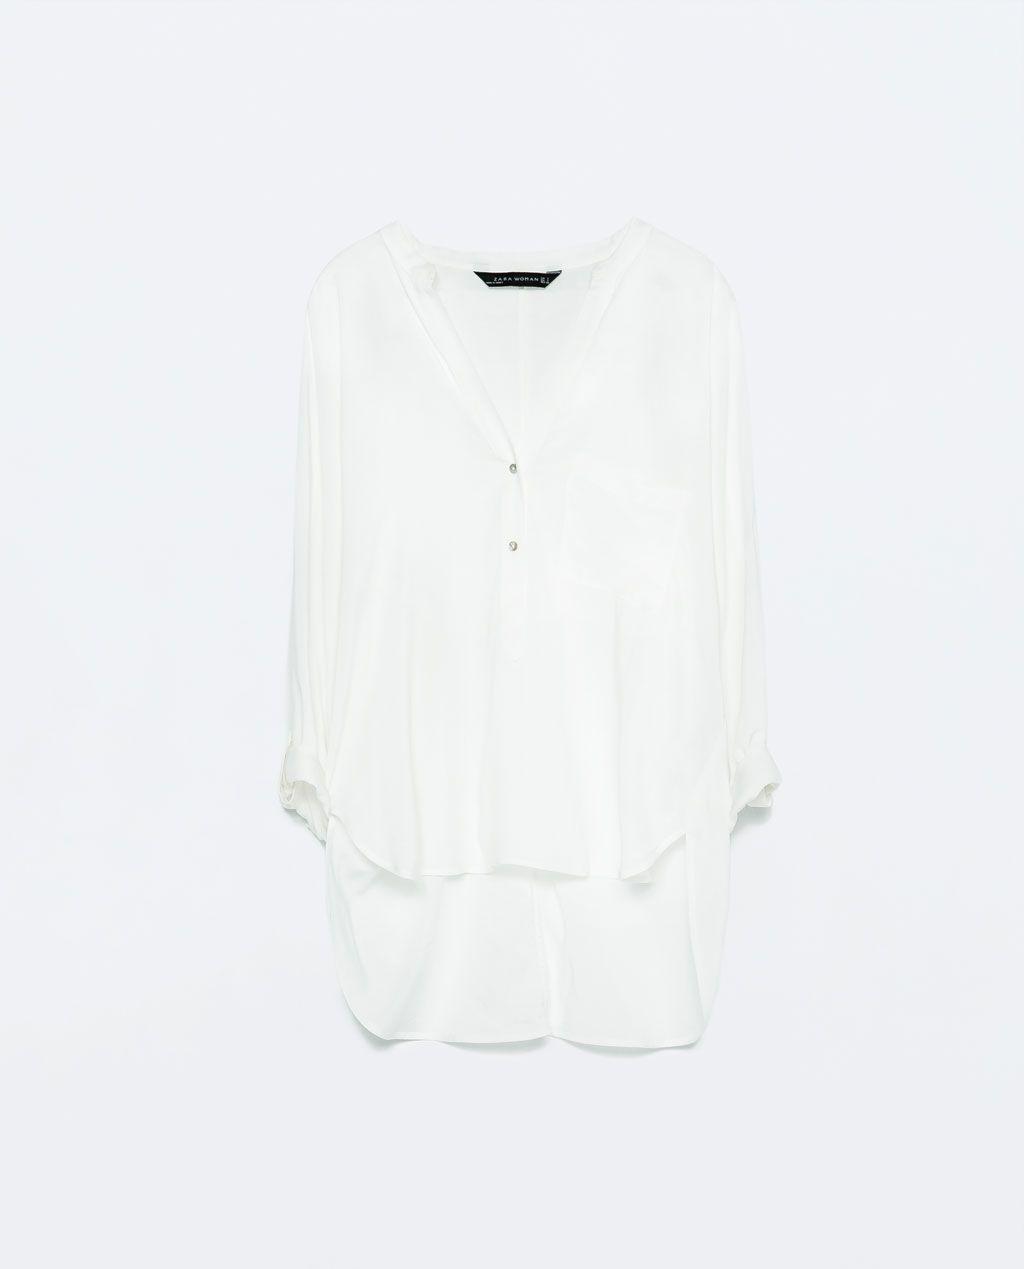 Desigual Blusa Mao Zara Camisas Bbva España Mujer Cuello Largo txq4FO